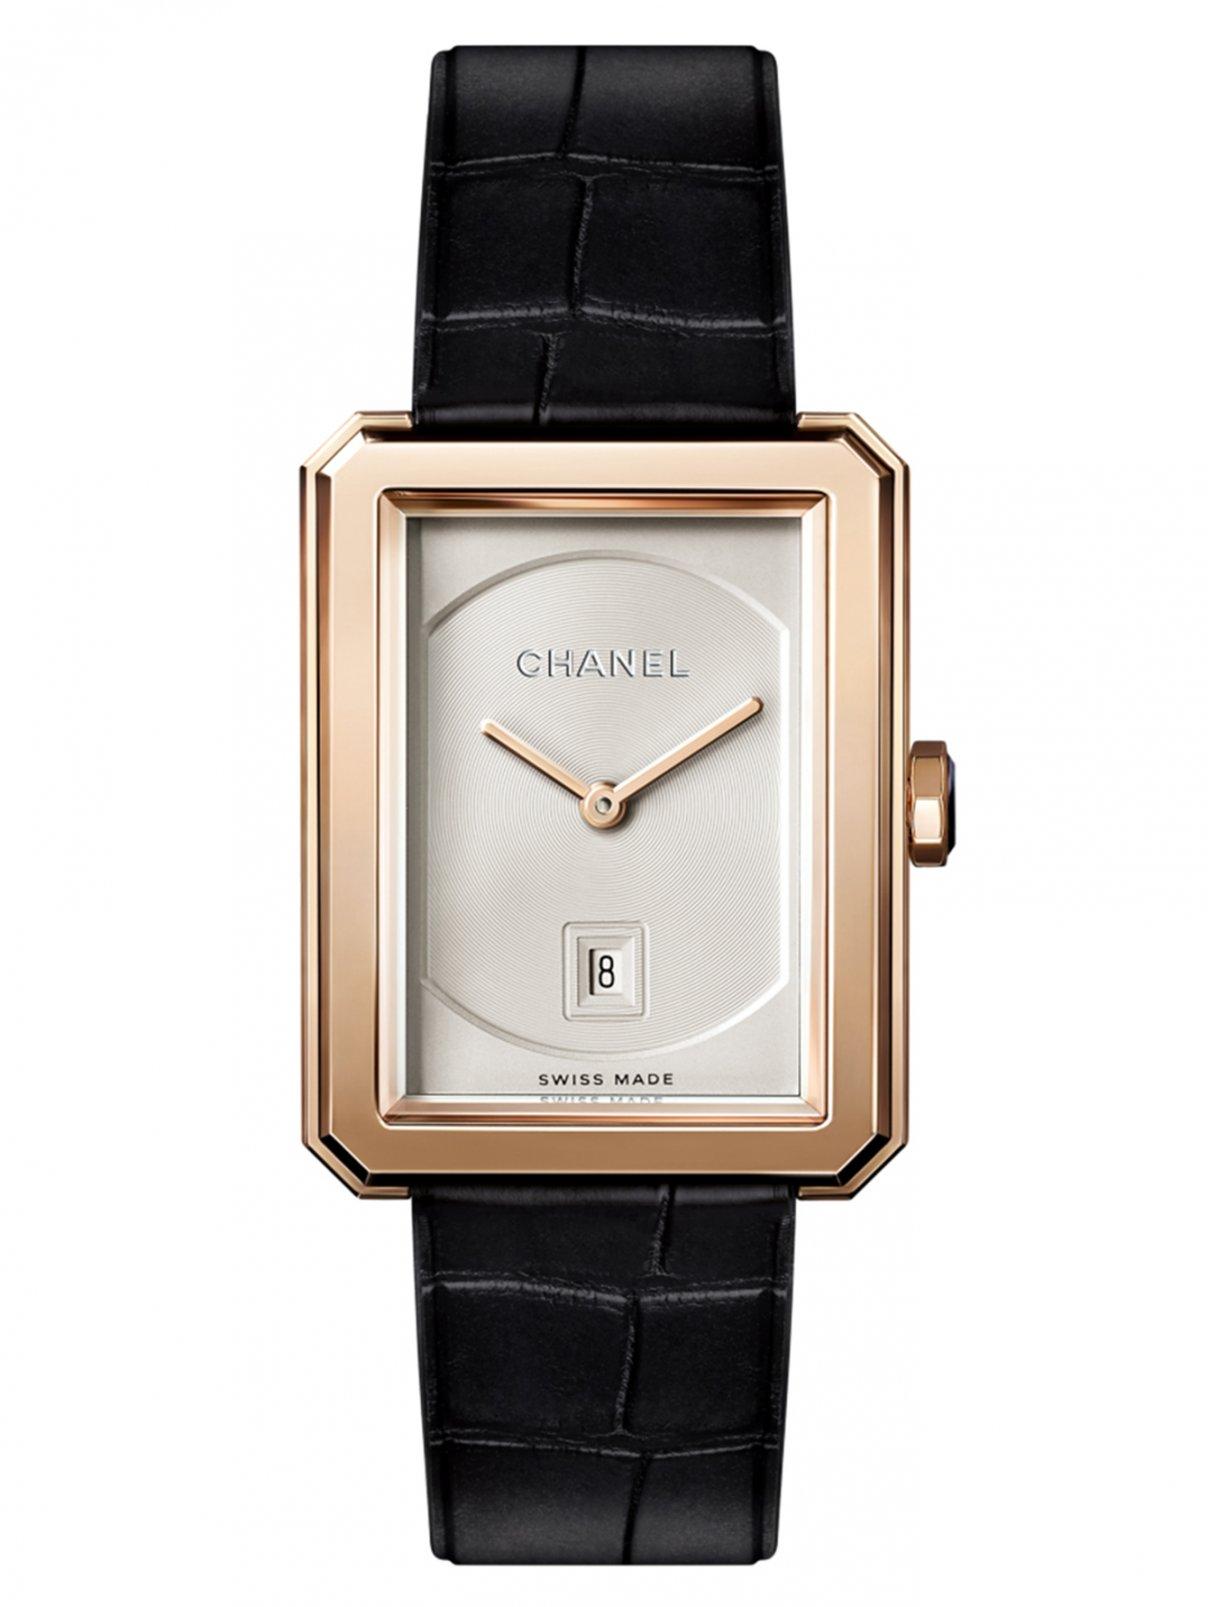 H4313 Boy-friend Chanel  –  Общий вид